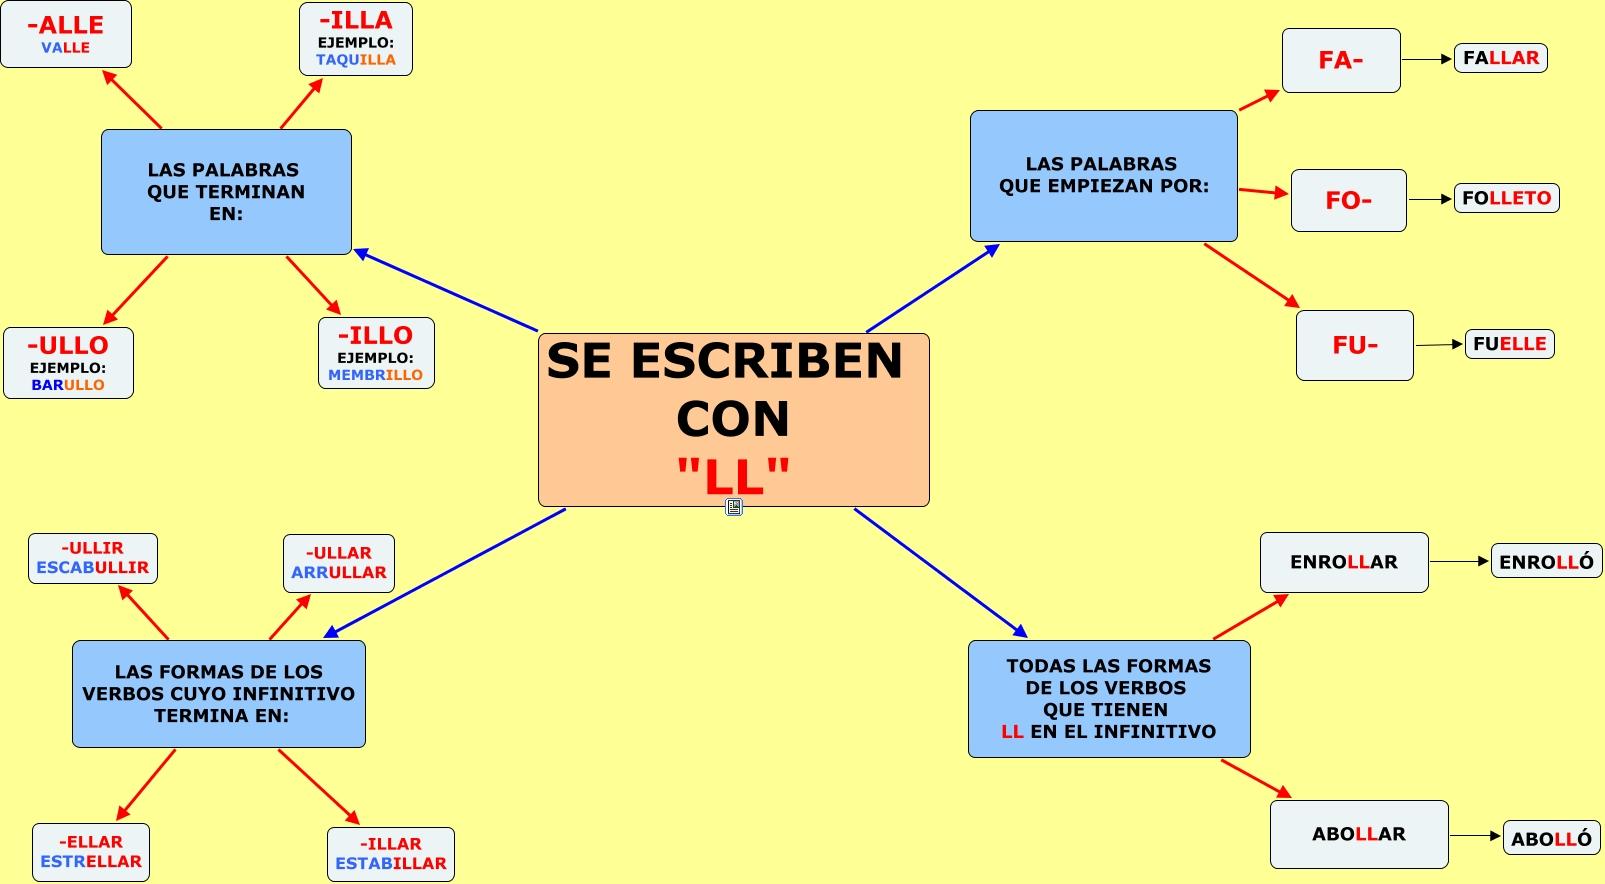 https://luisamariaarias.files.wordpress.com/2012/04/uso-de-la-ll.jpg